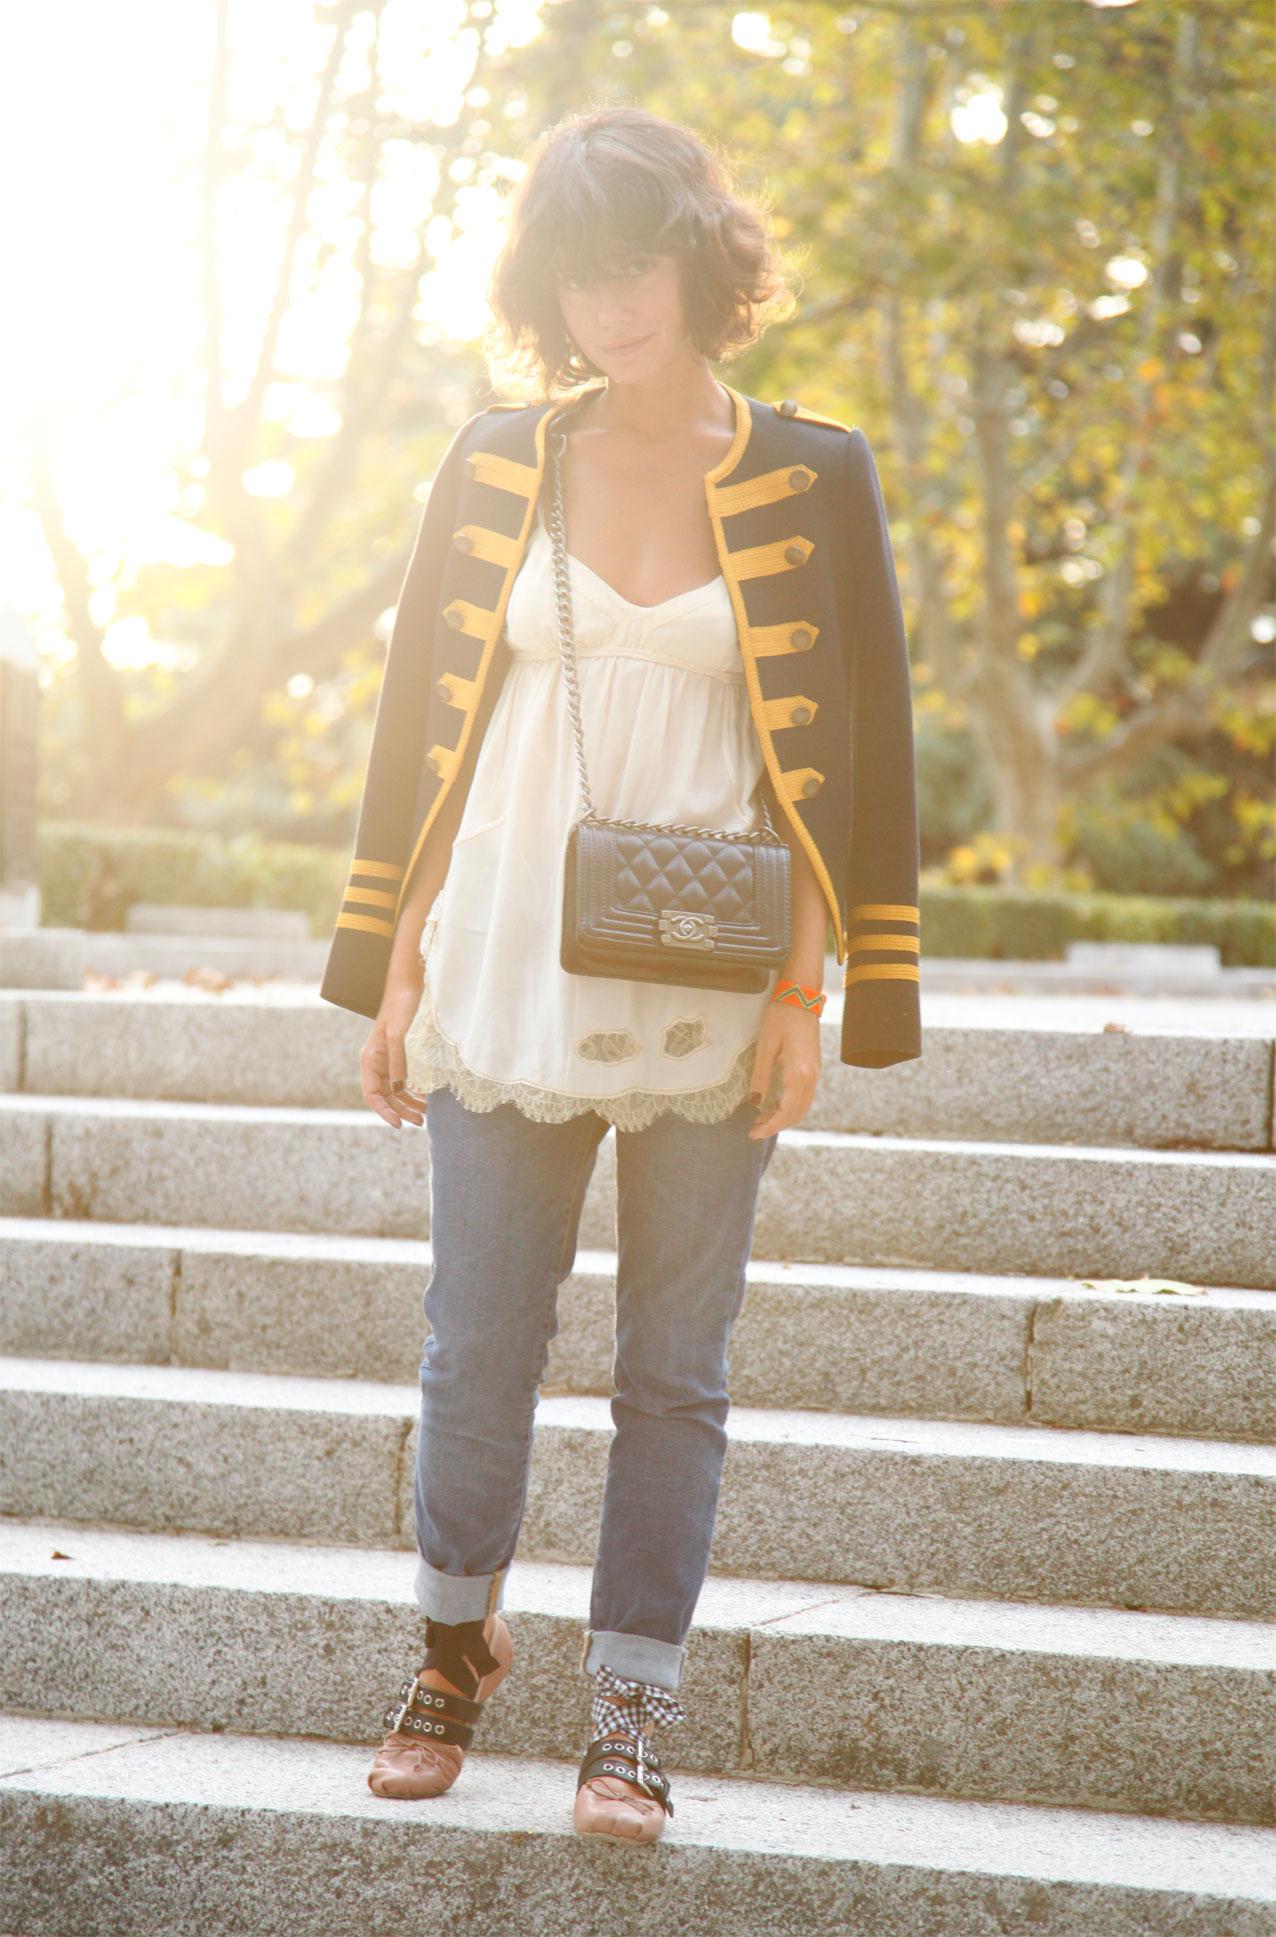 militar_jacket-lencero_autumn_look_miumiu_ballerinas_streetstyle-cool_lemonade-8